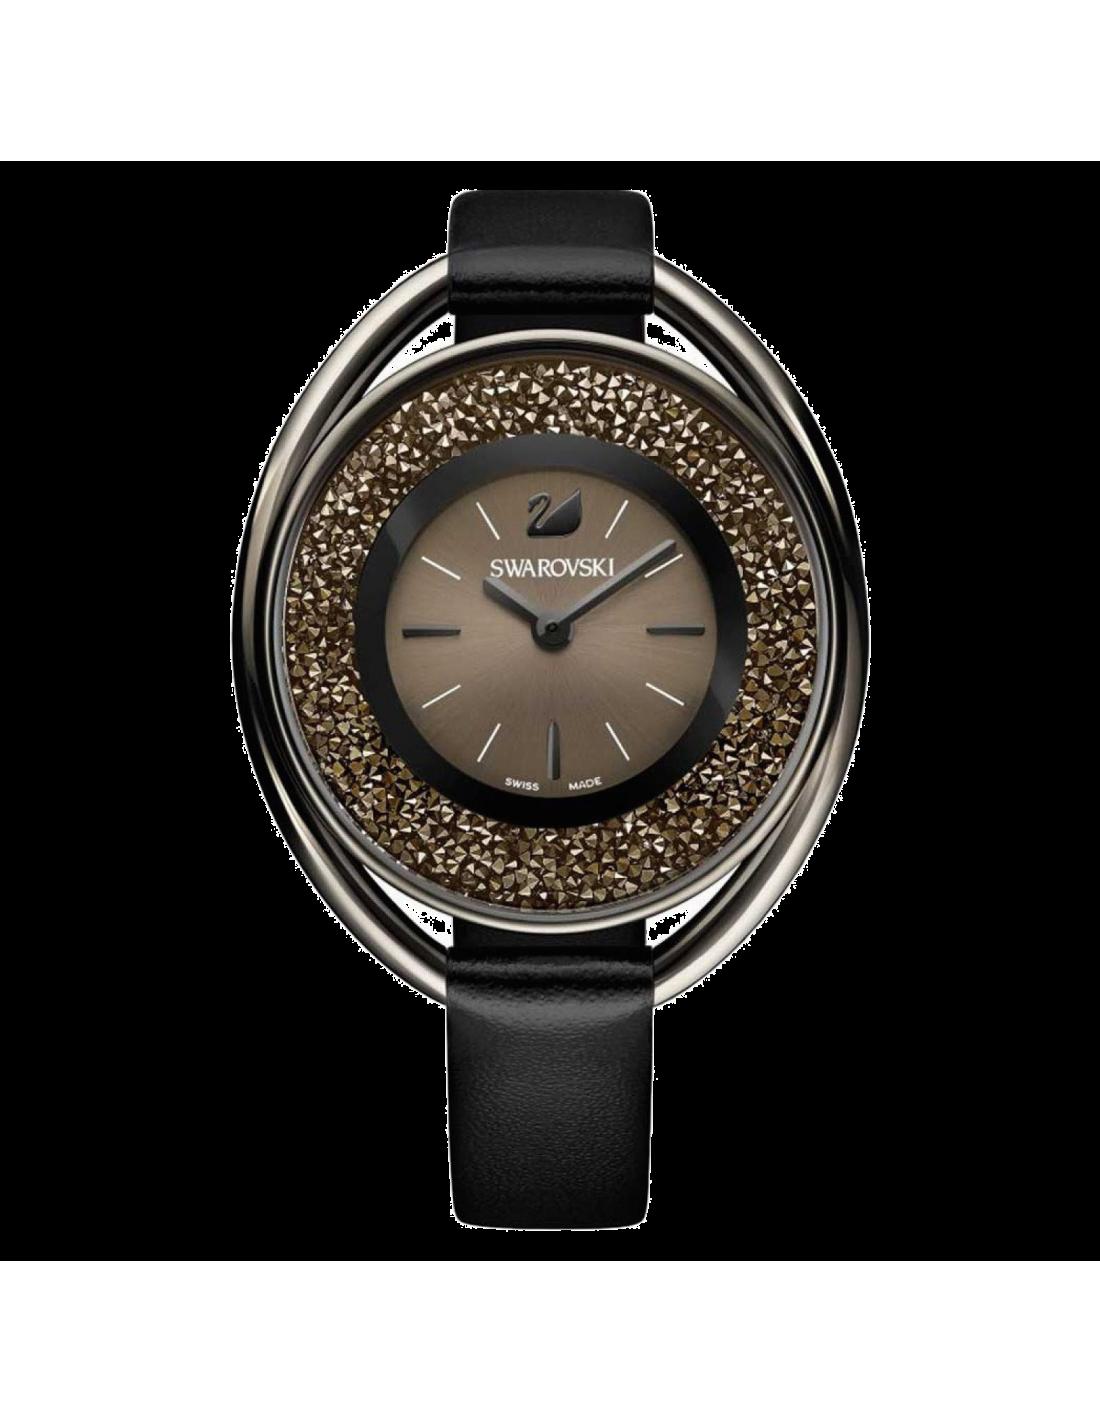 Montre Femme Swarovski Crystalline 5158517 à 299,00 € ➤...